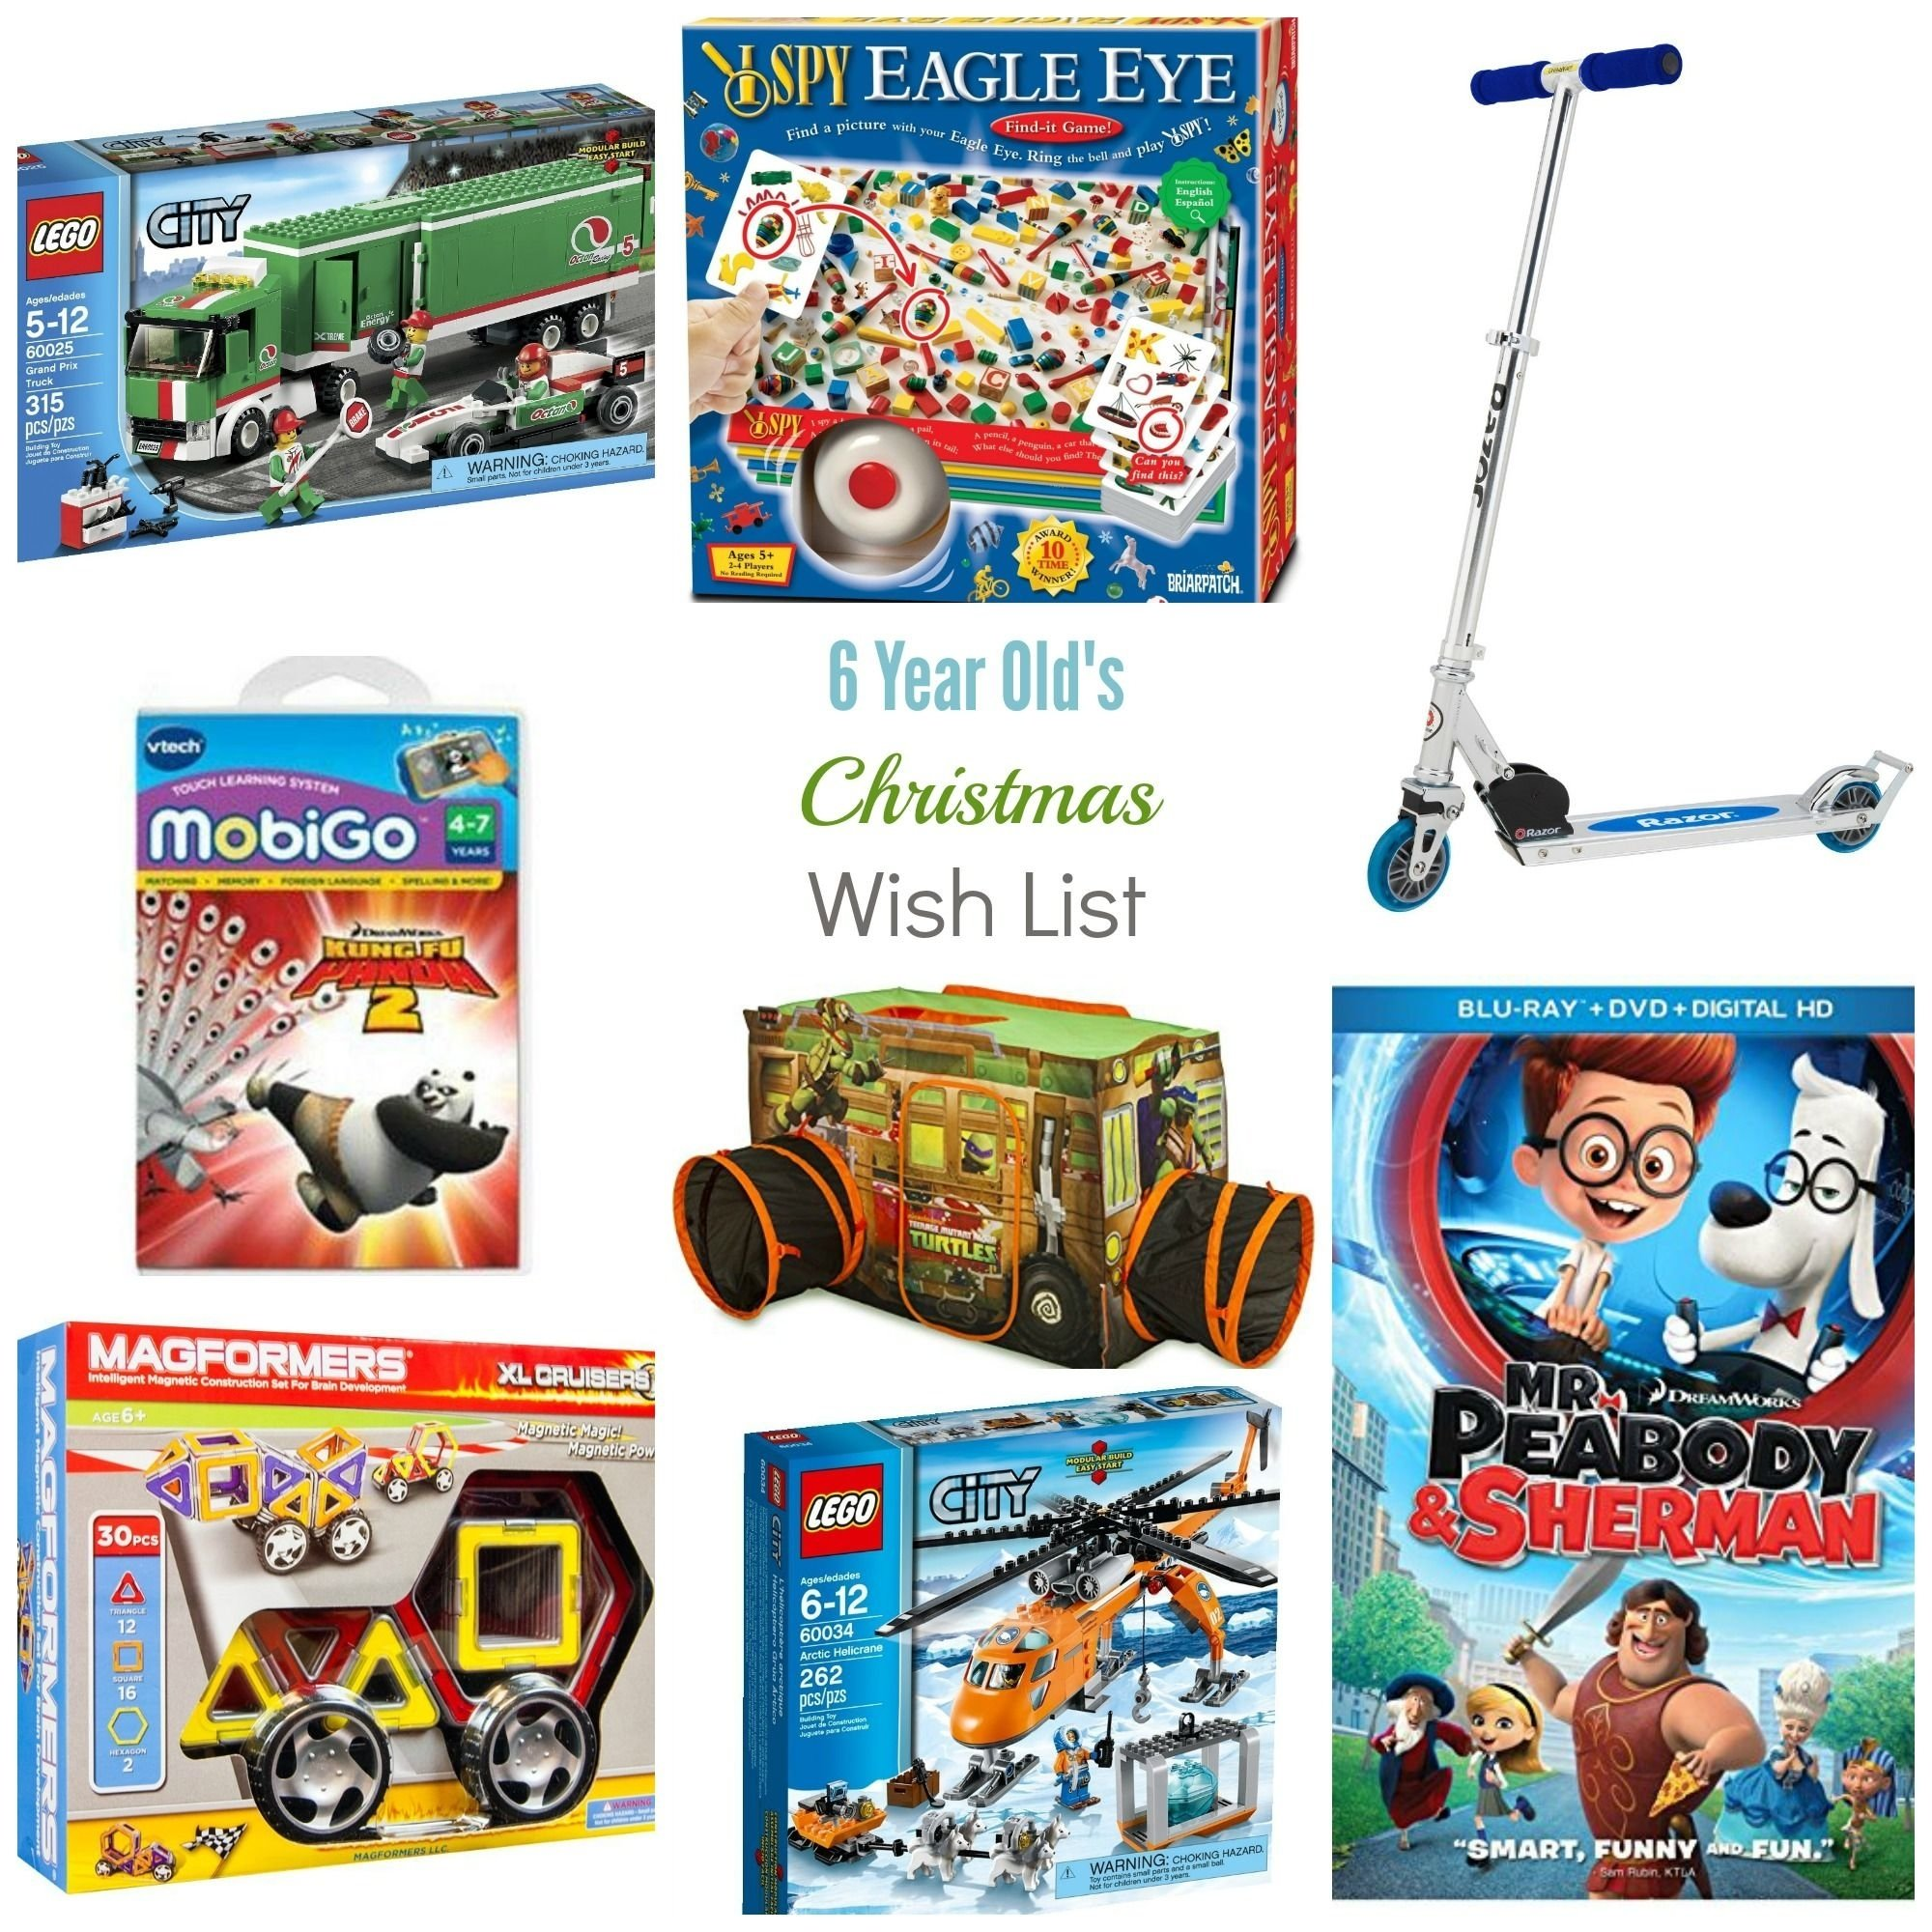 10 Ideal Birthday Gift Ideas For 6 Year Old Boy Christmas Wish List